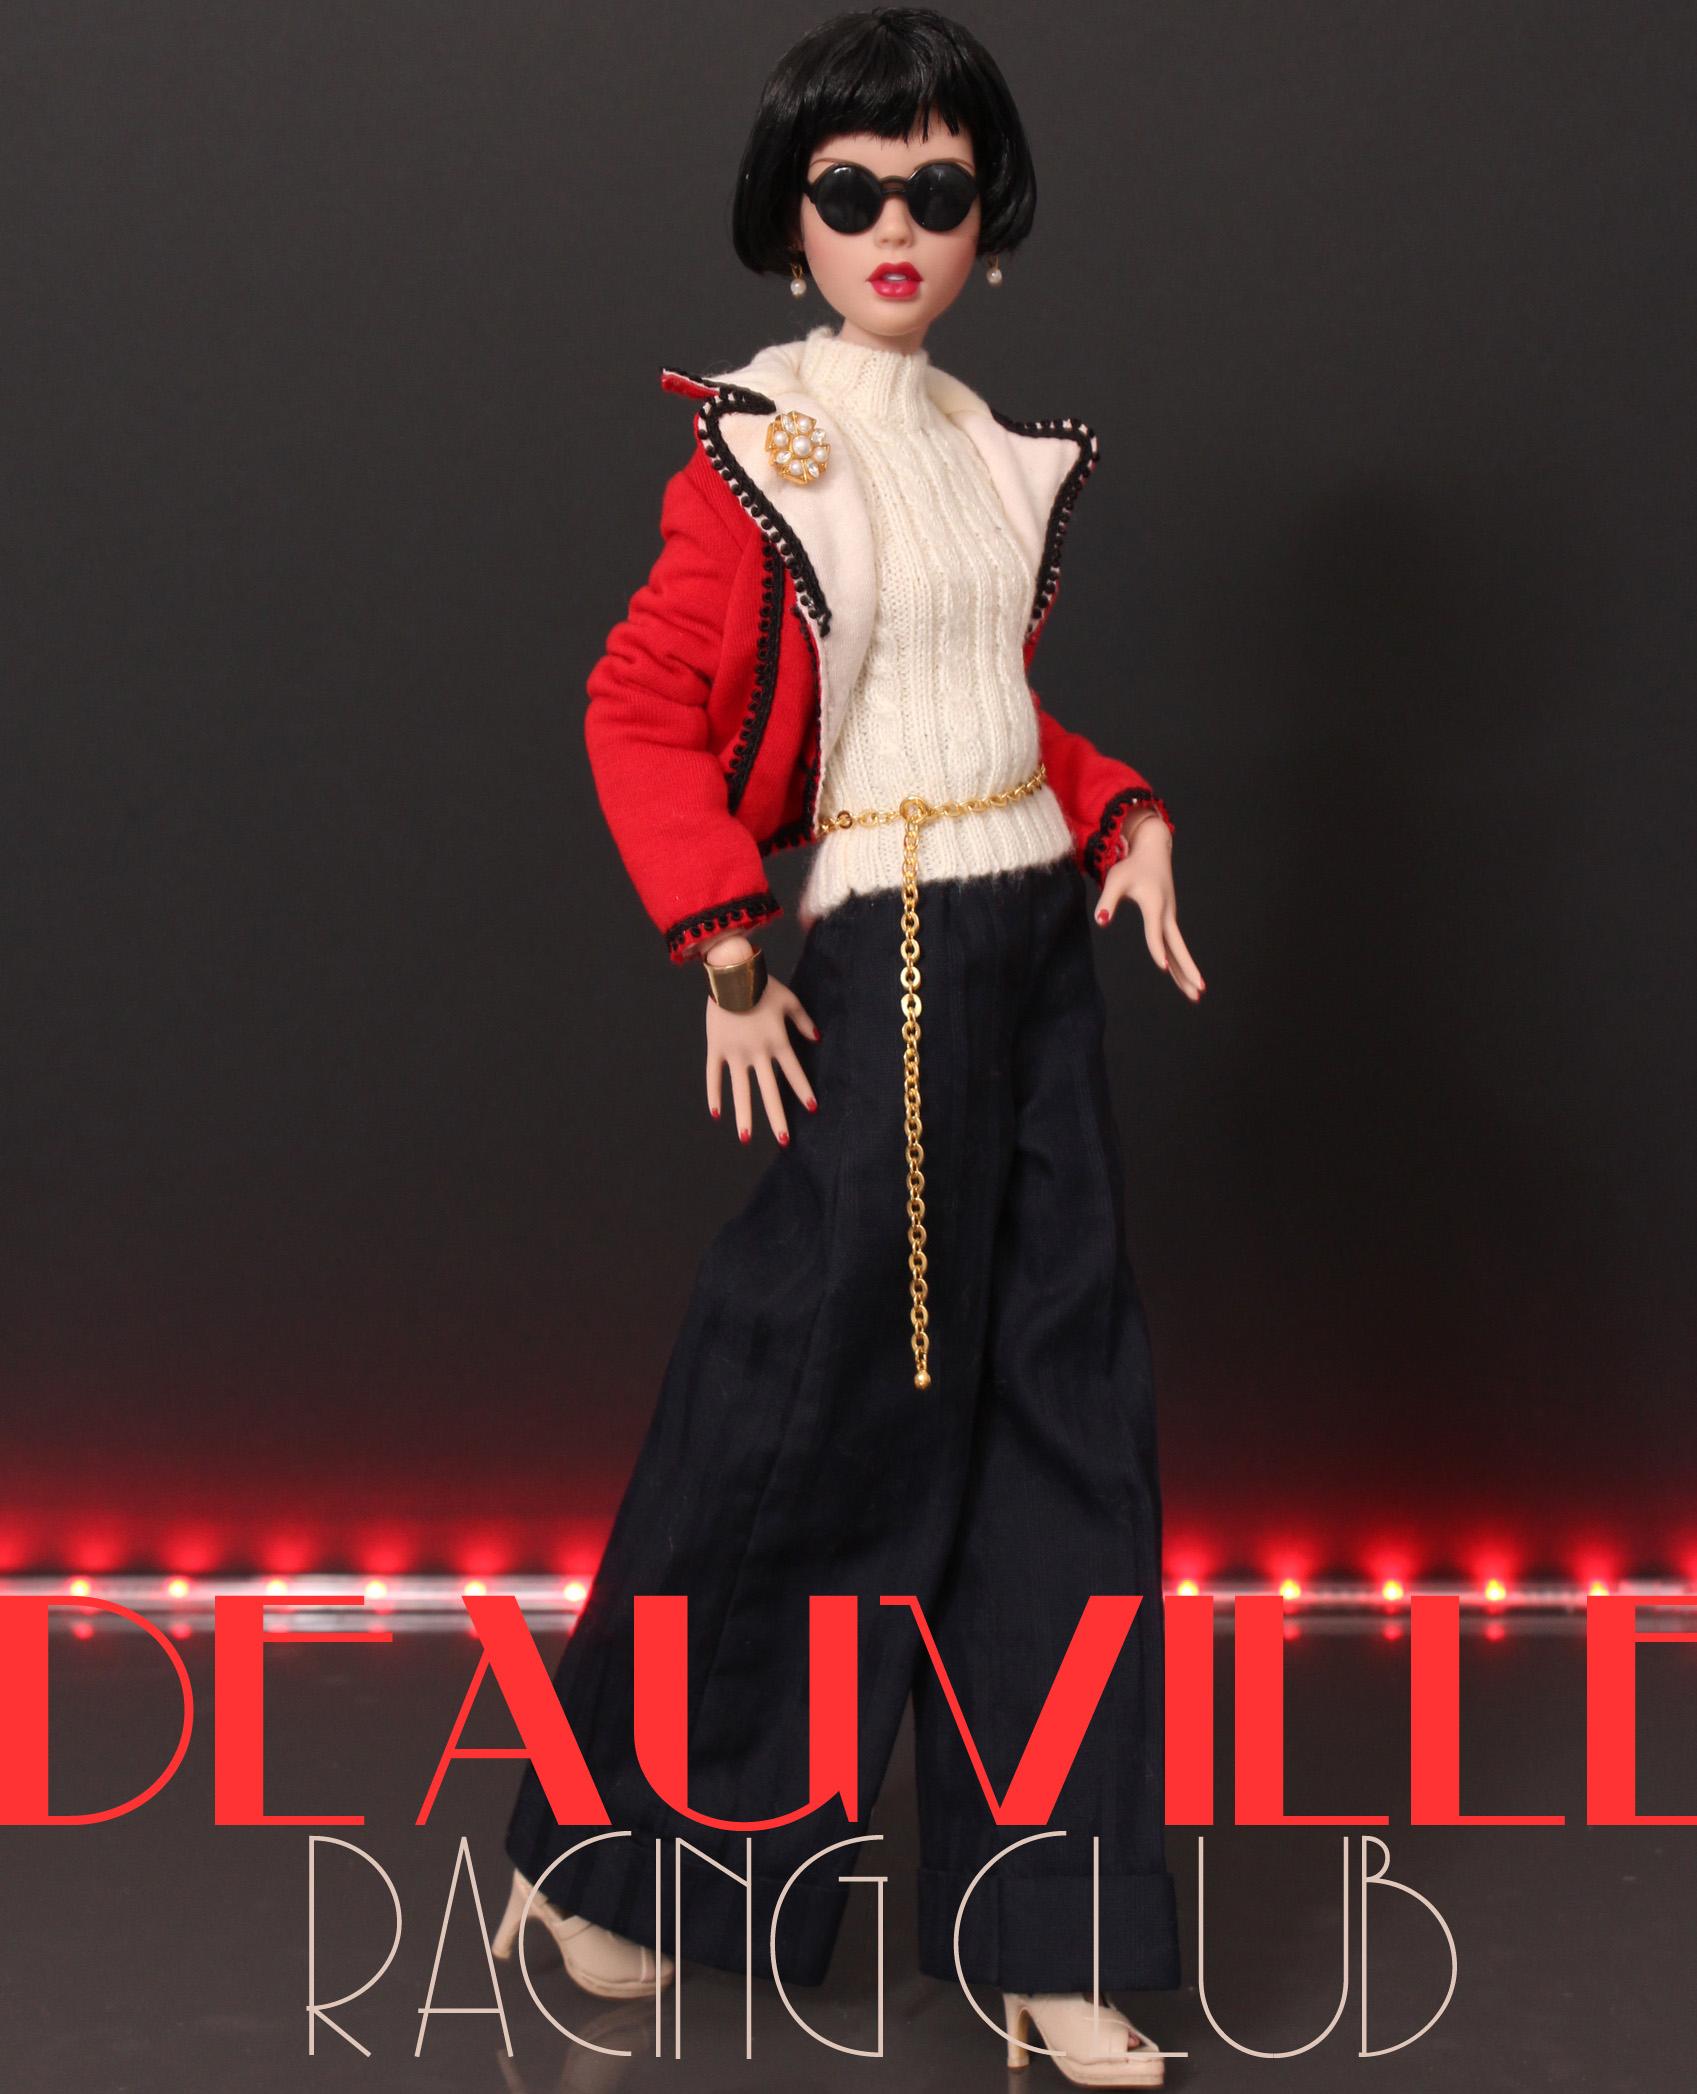 Deauville - Miss Vinyl Booklet